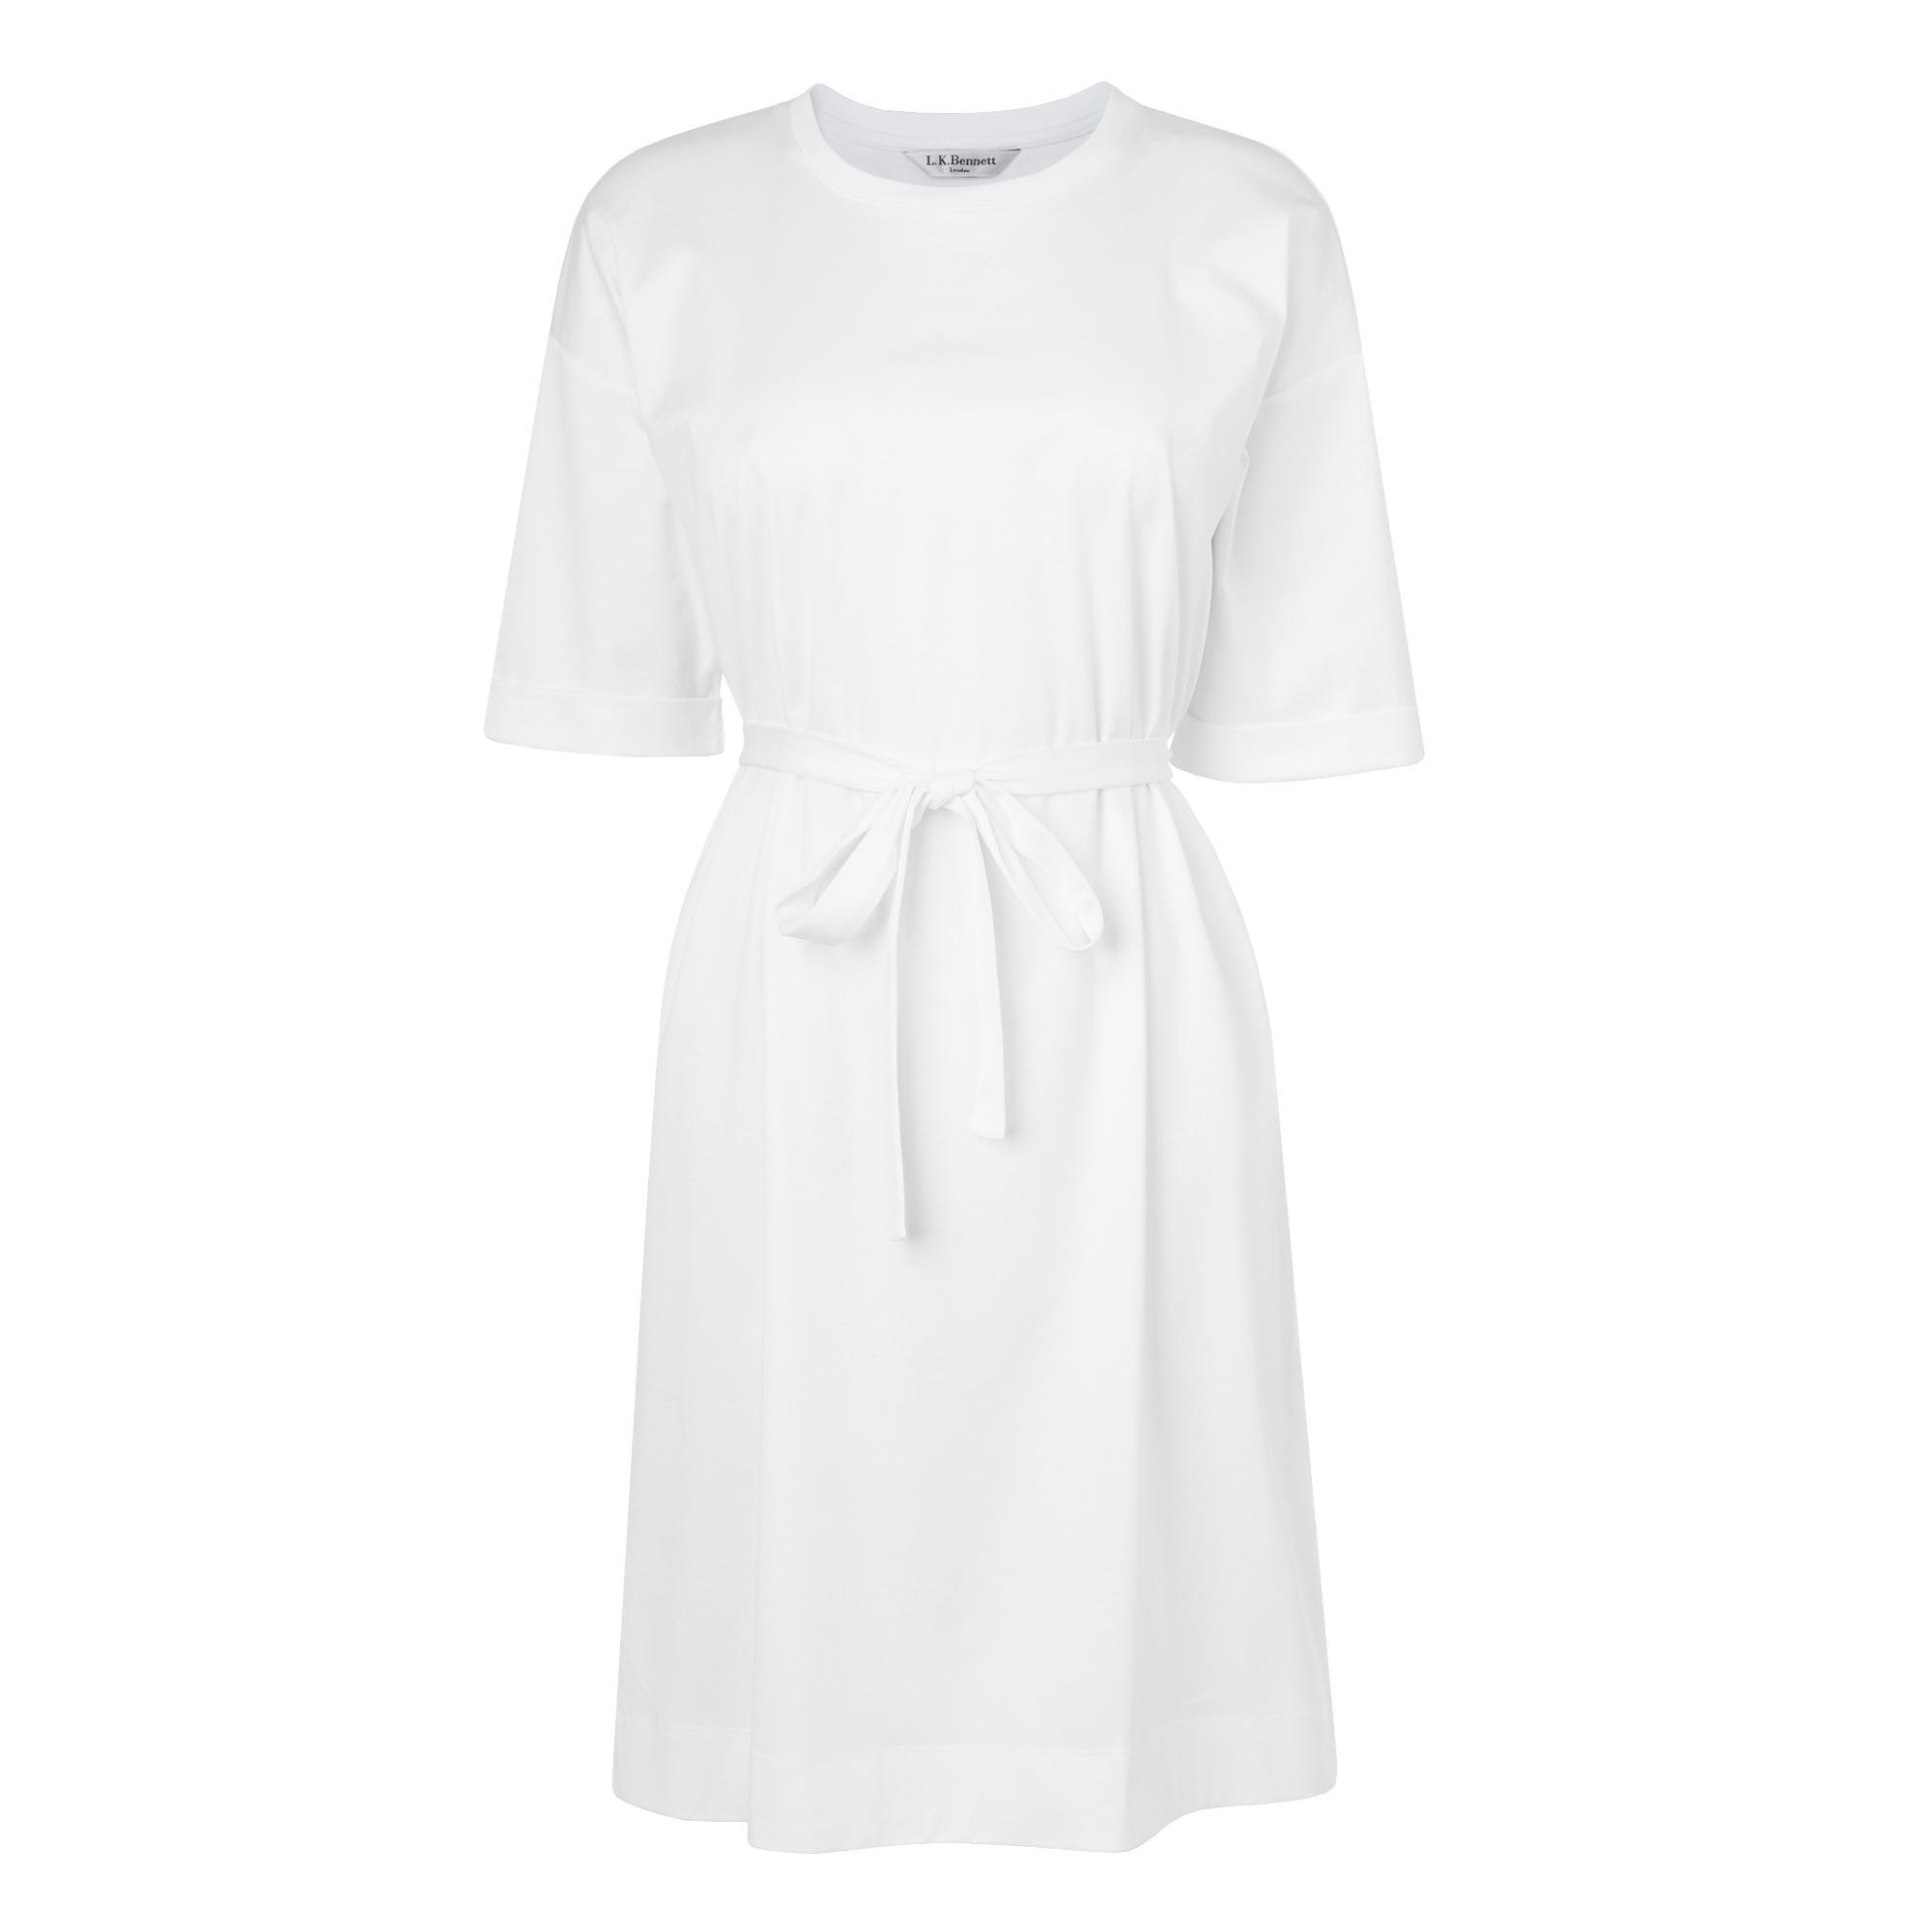 Adana White Jersey Dress